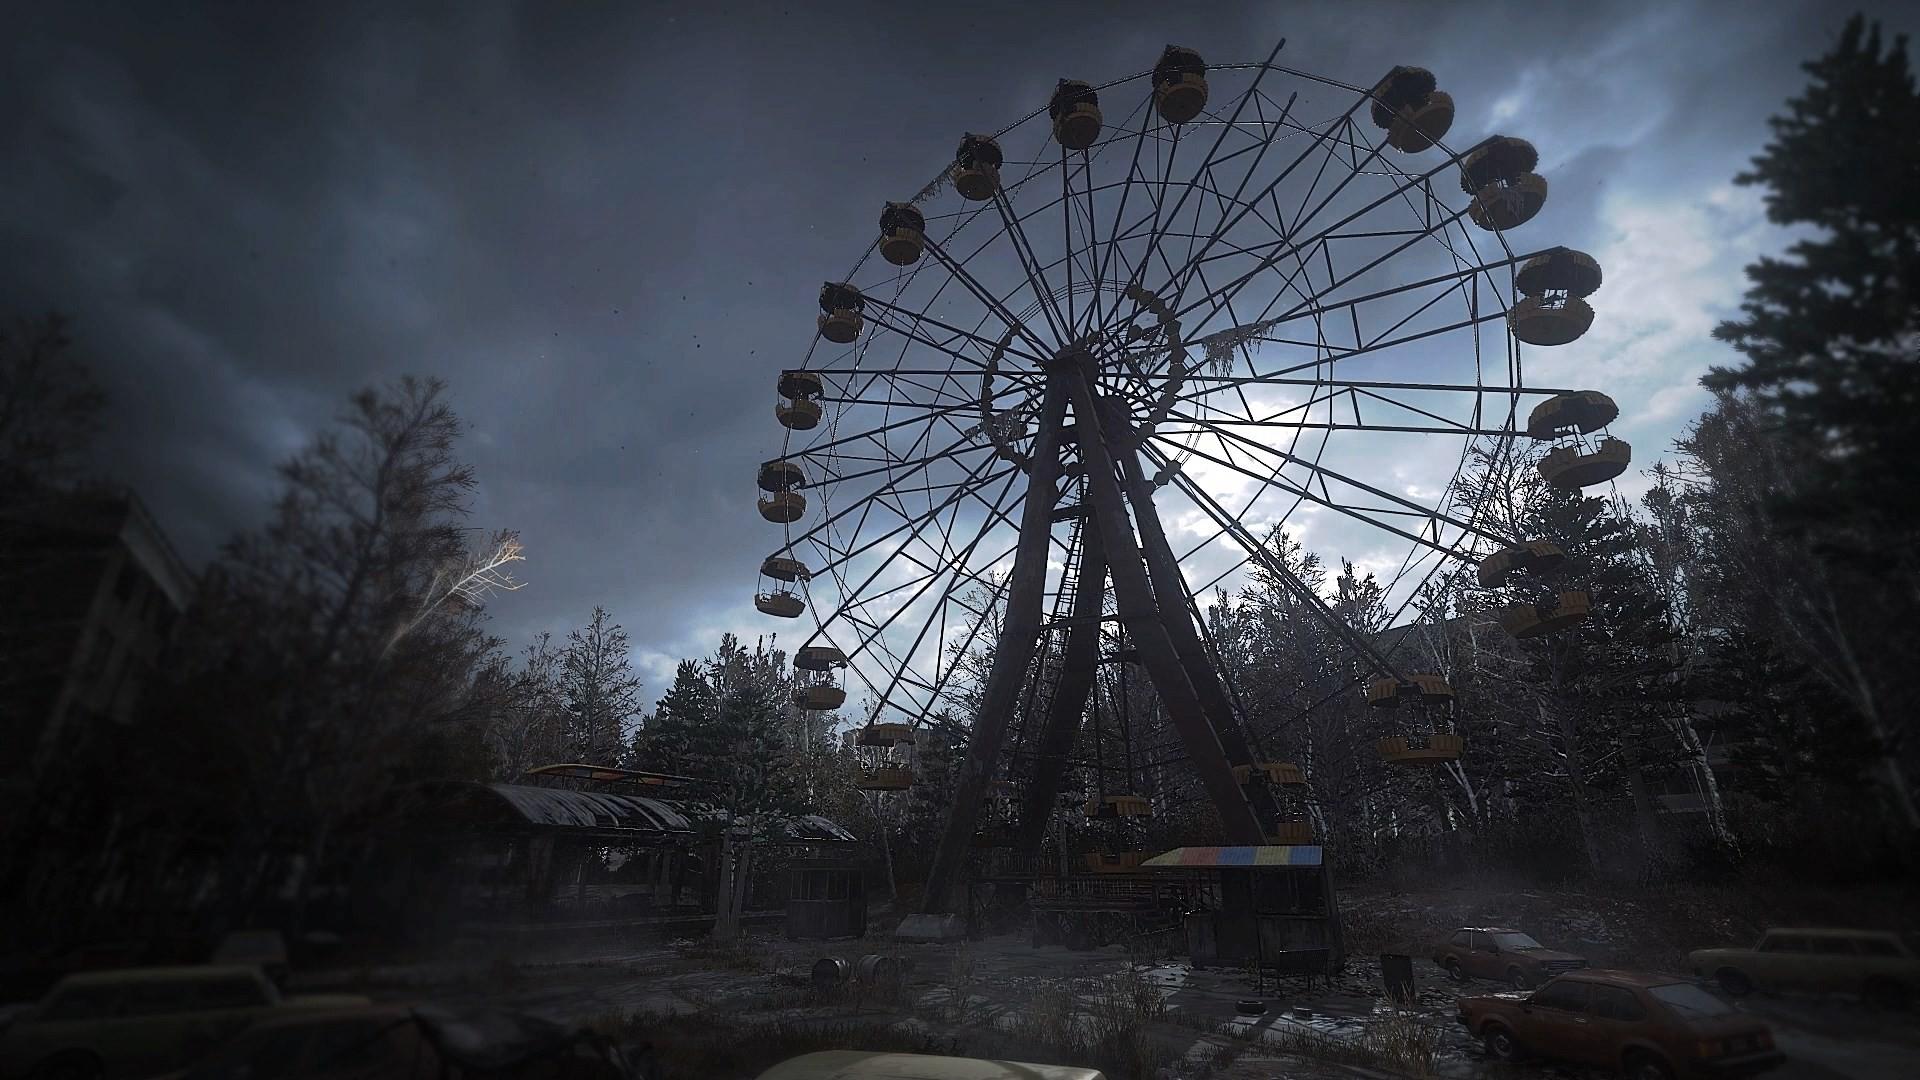 Wallpaper Desktop 1366x768 Car Wallpaper Night Park Ferris Wheel Chernobyl Pripyat